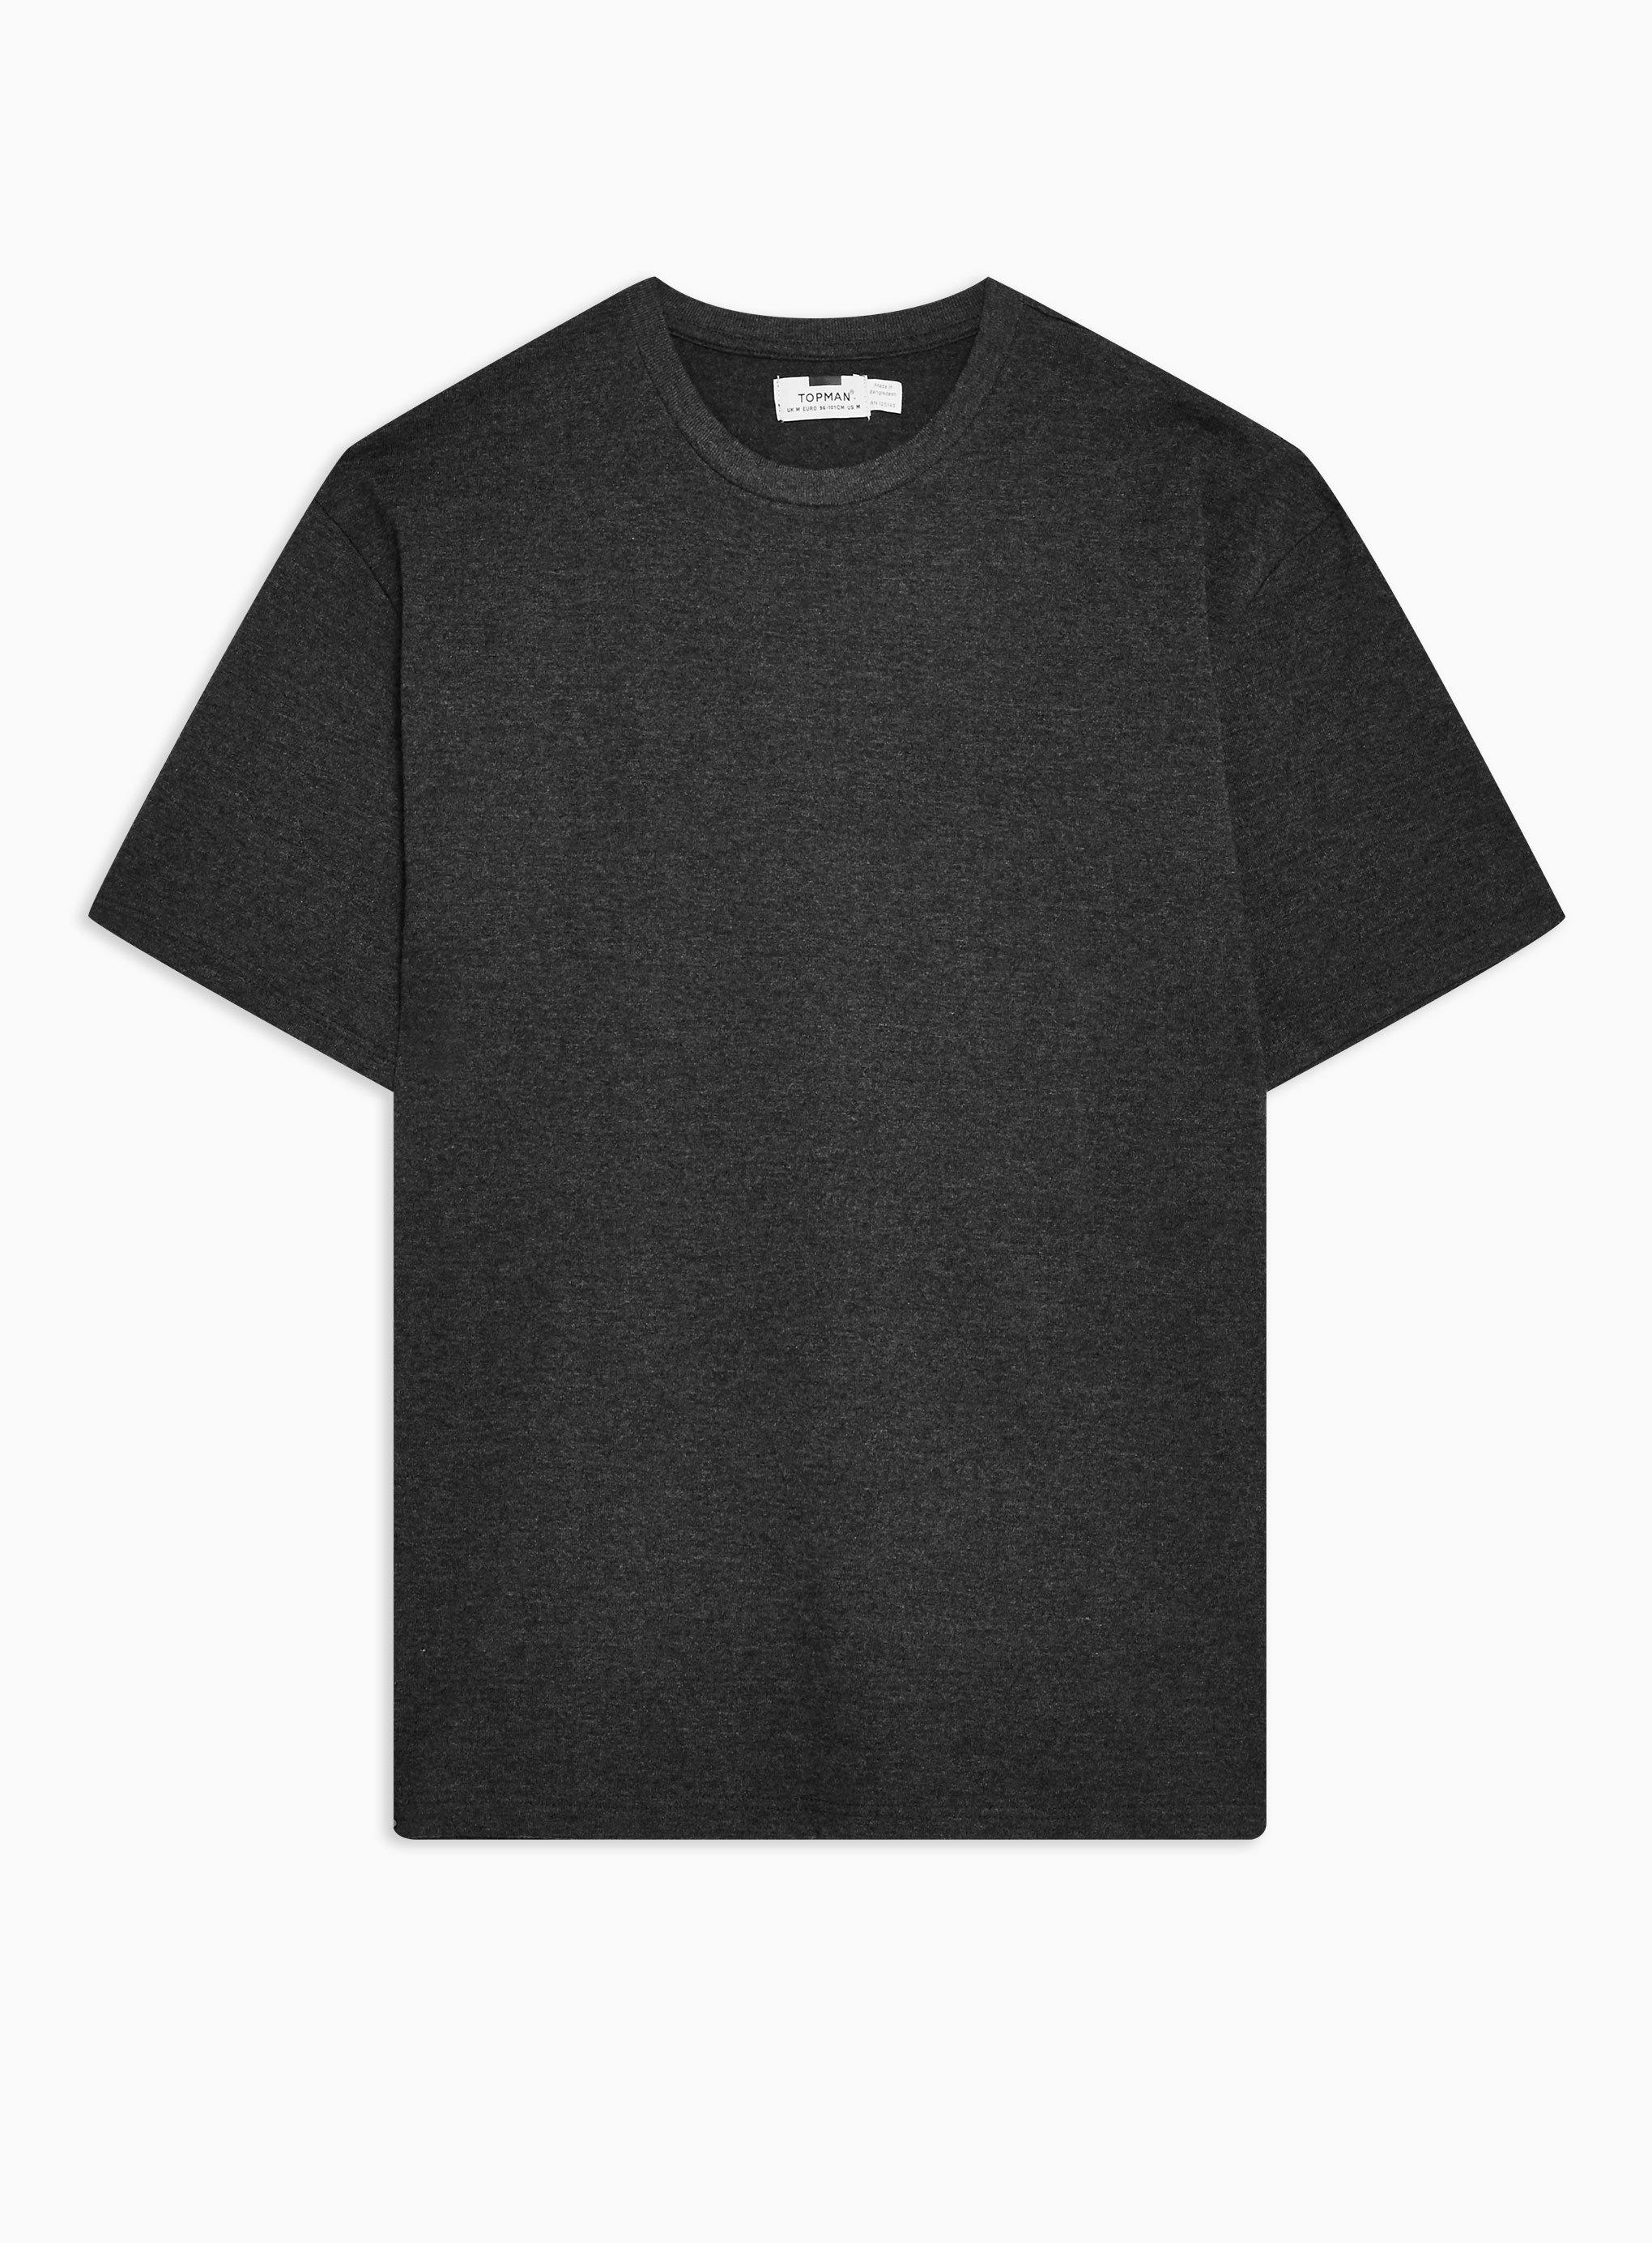 3ffada70 Topman - Gray Charcoalmarl Oversized T-shirt for Men - Lyst. View fullscreen